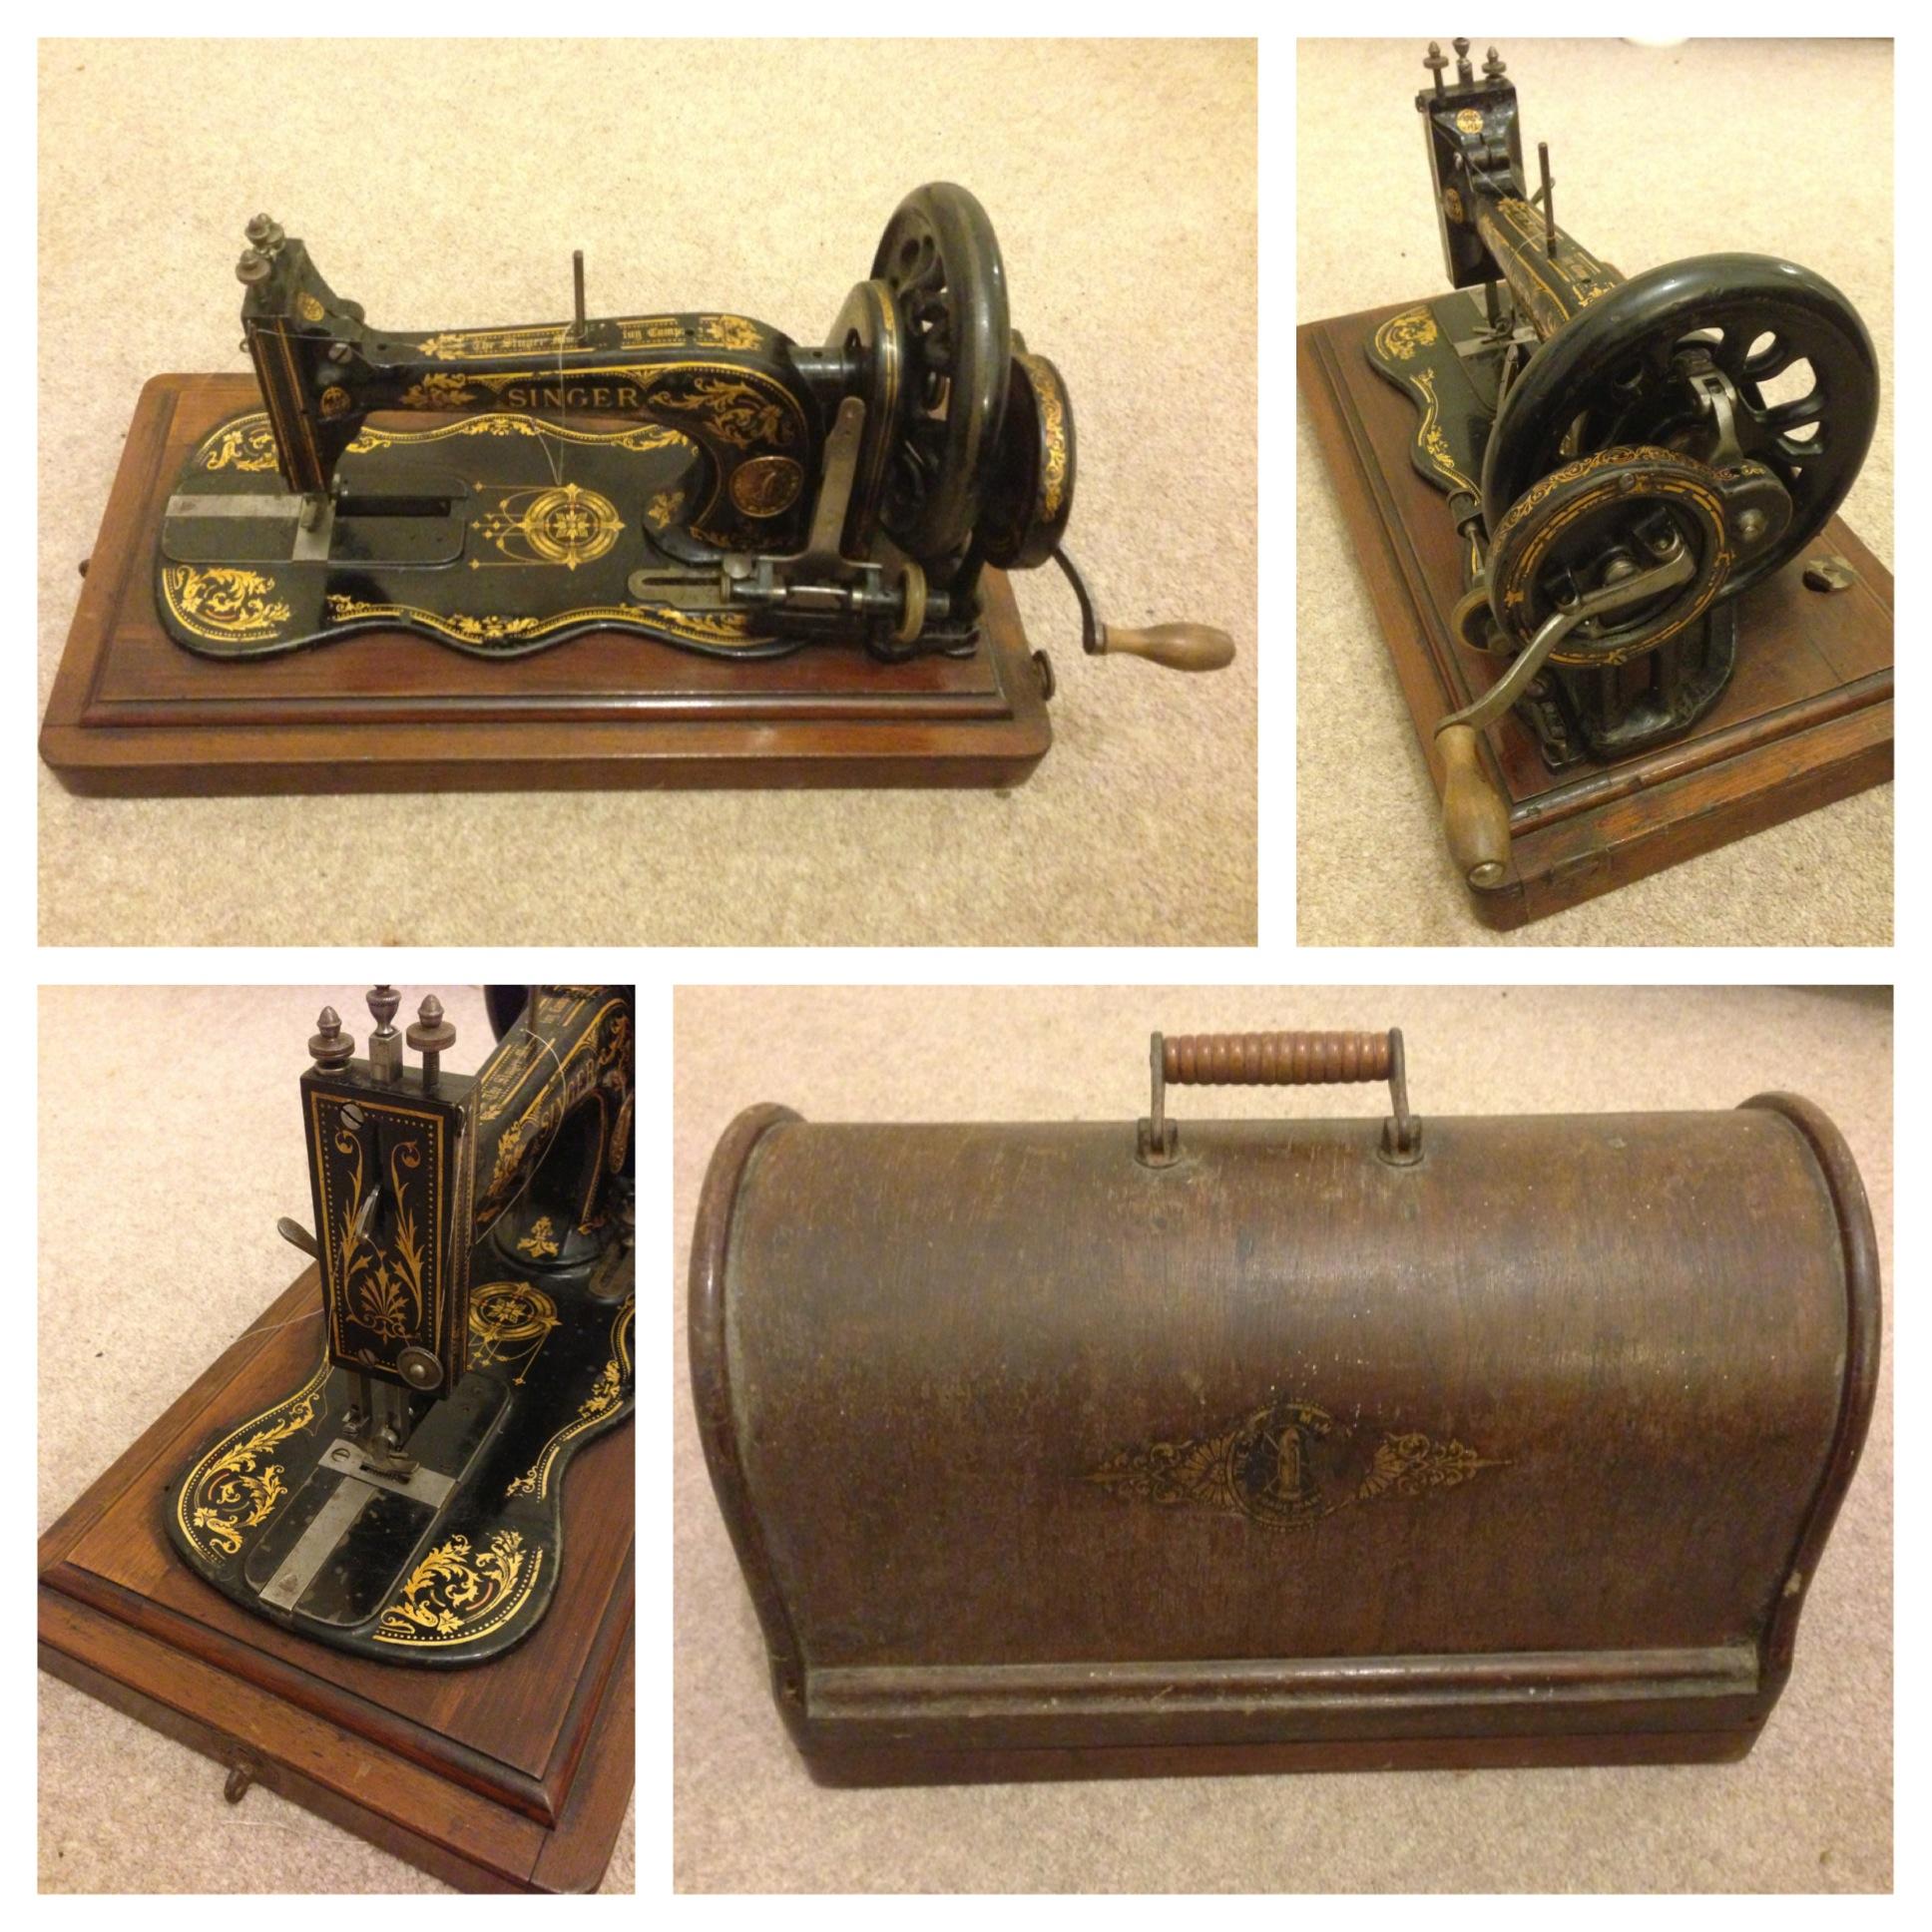 Antique 1890 Singer Sewing Machine